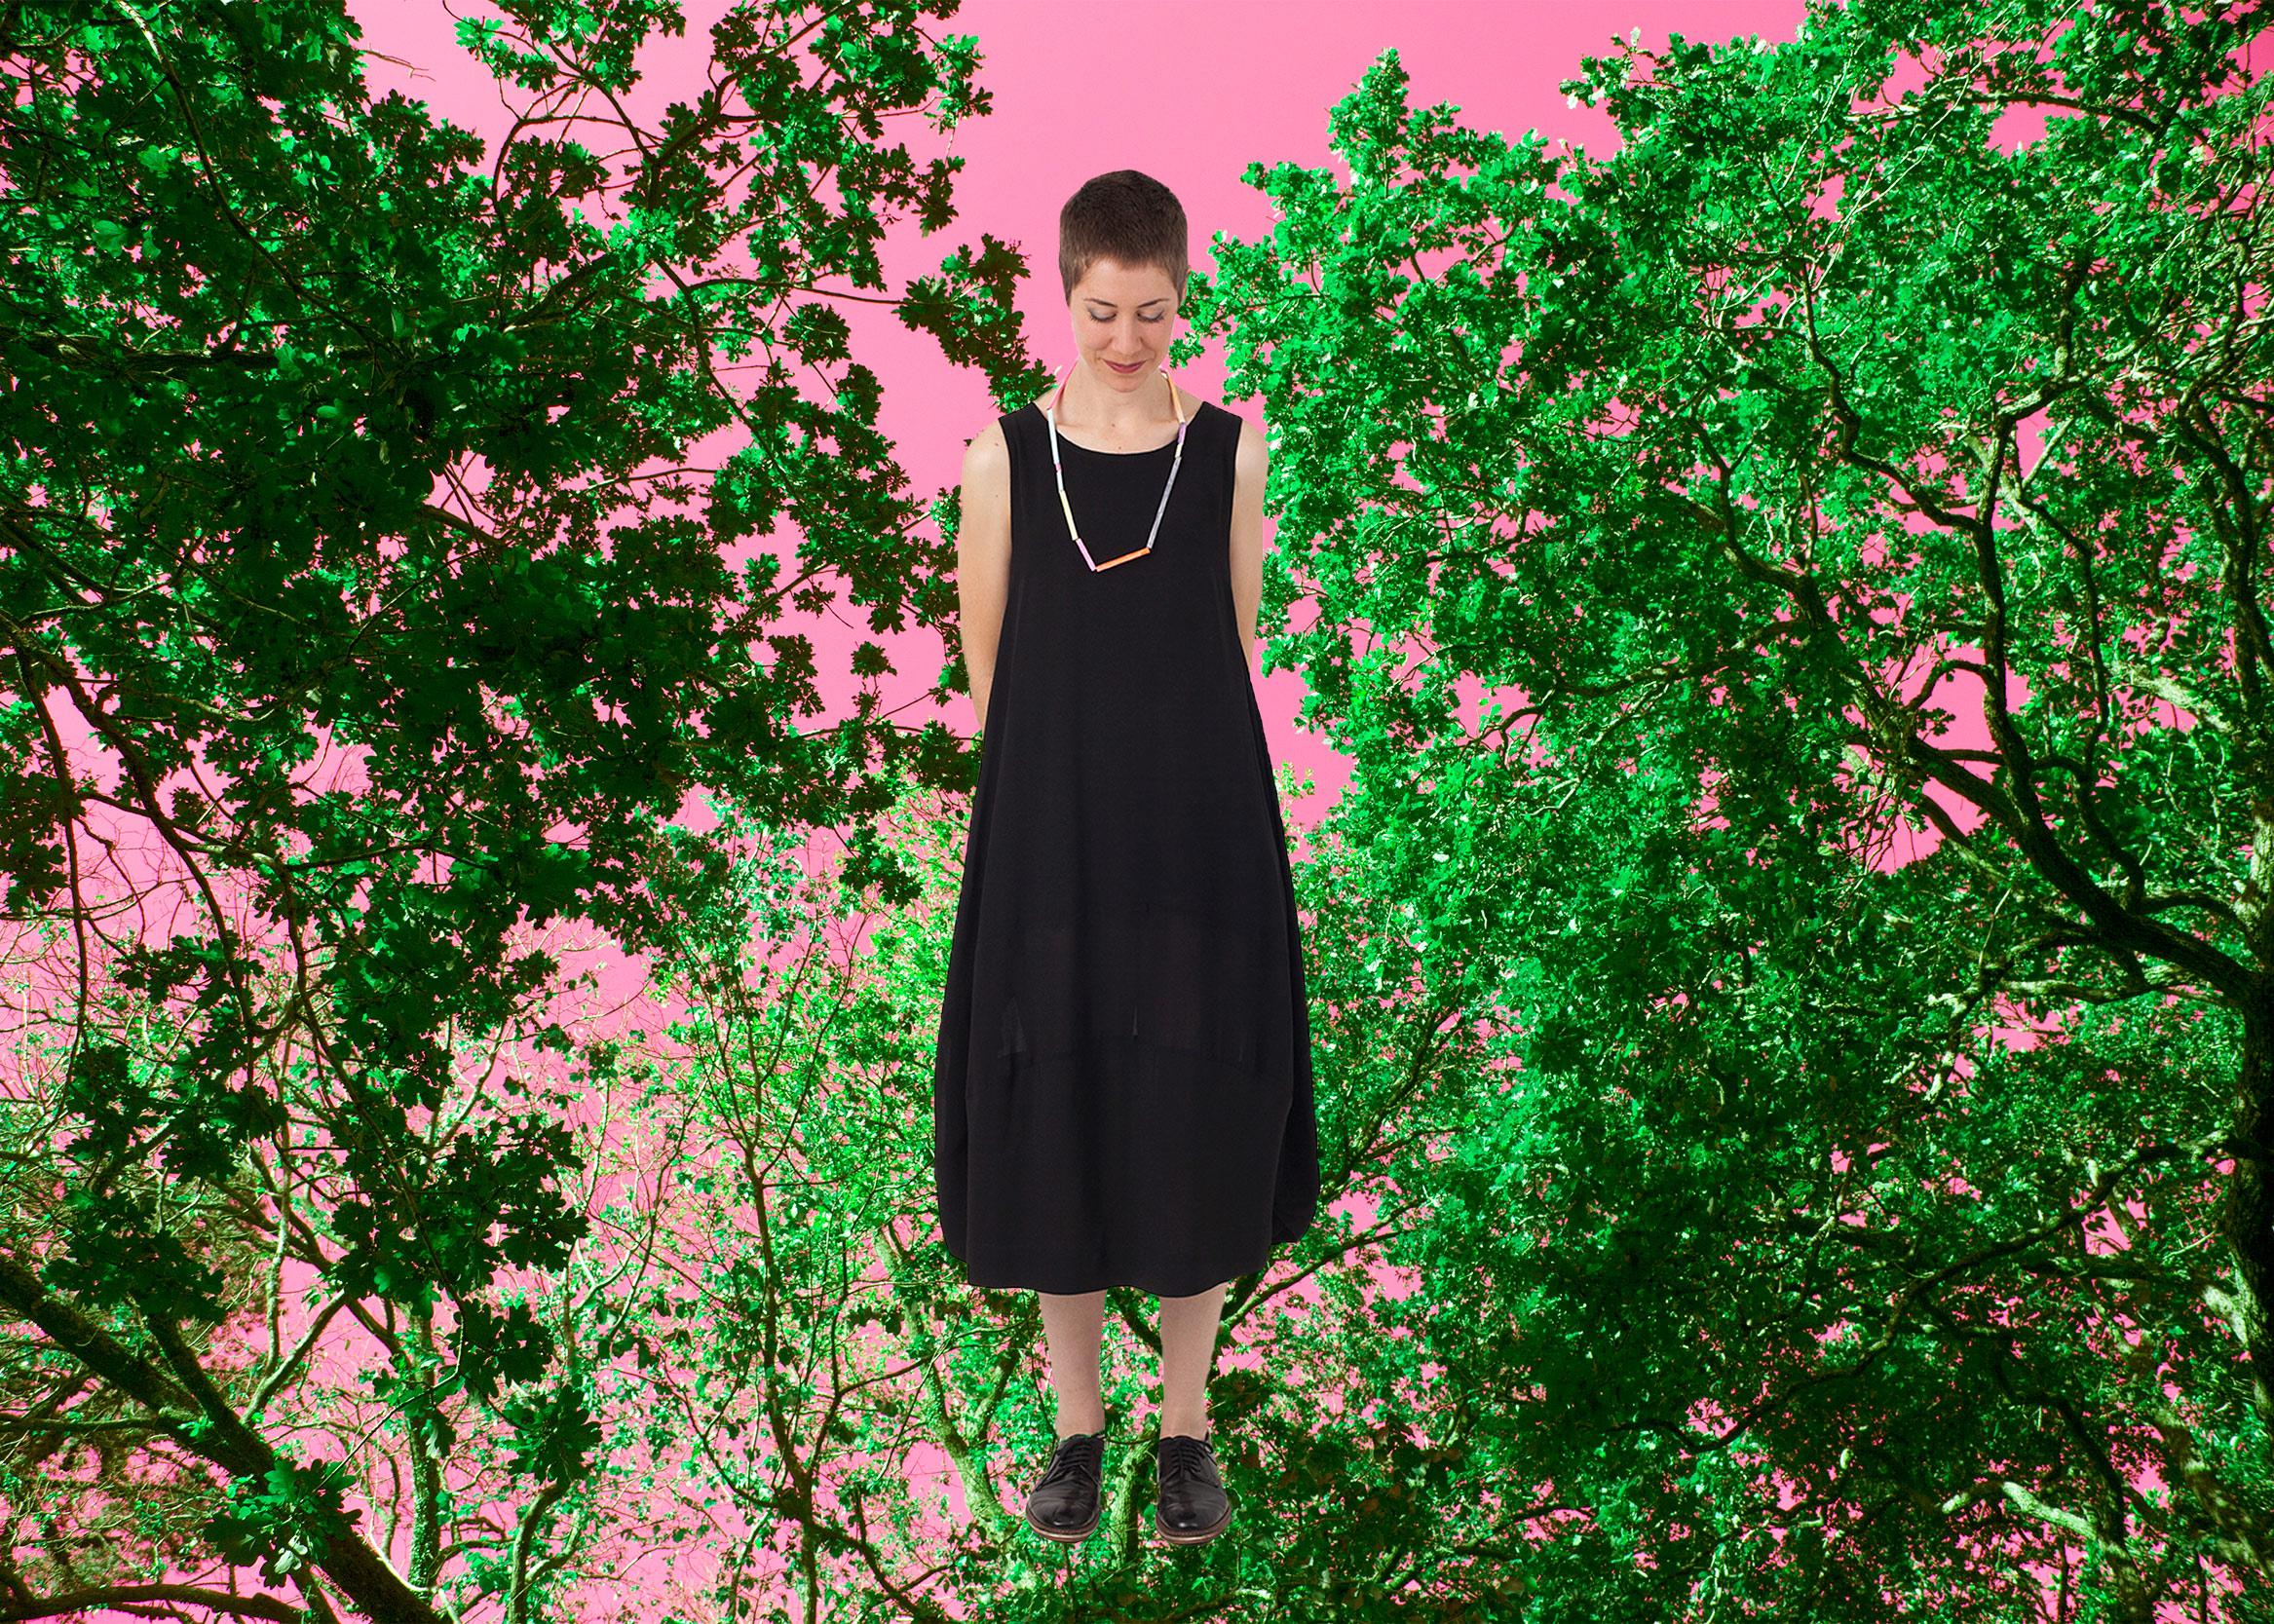 3_web_Fraser-Crowe_ST_K_Pop_UP_Wasteless-Dress.jpg